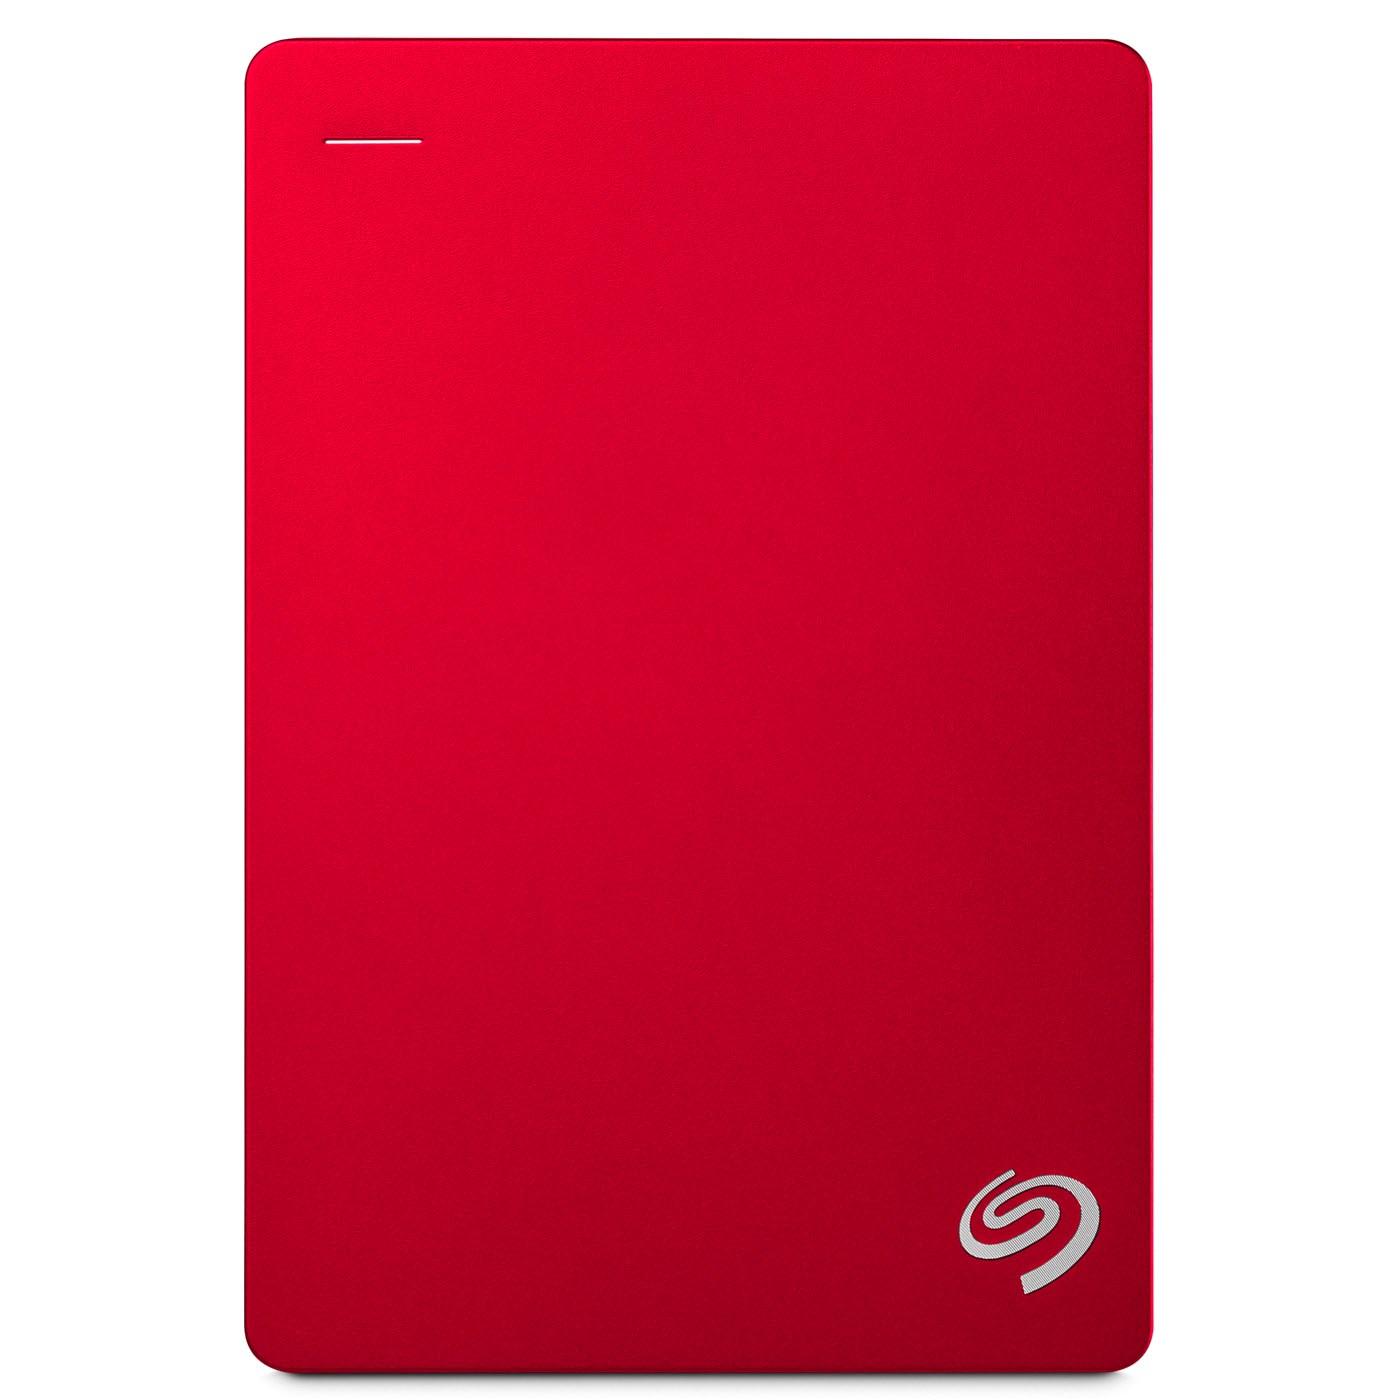 2.5  Drive External Seagate Backup Plus Portable STHP4000403 4 TB Hard Drive